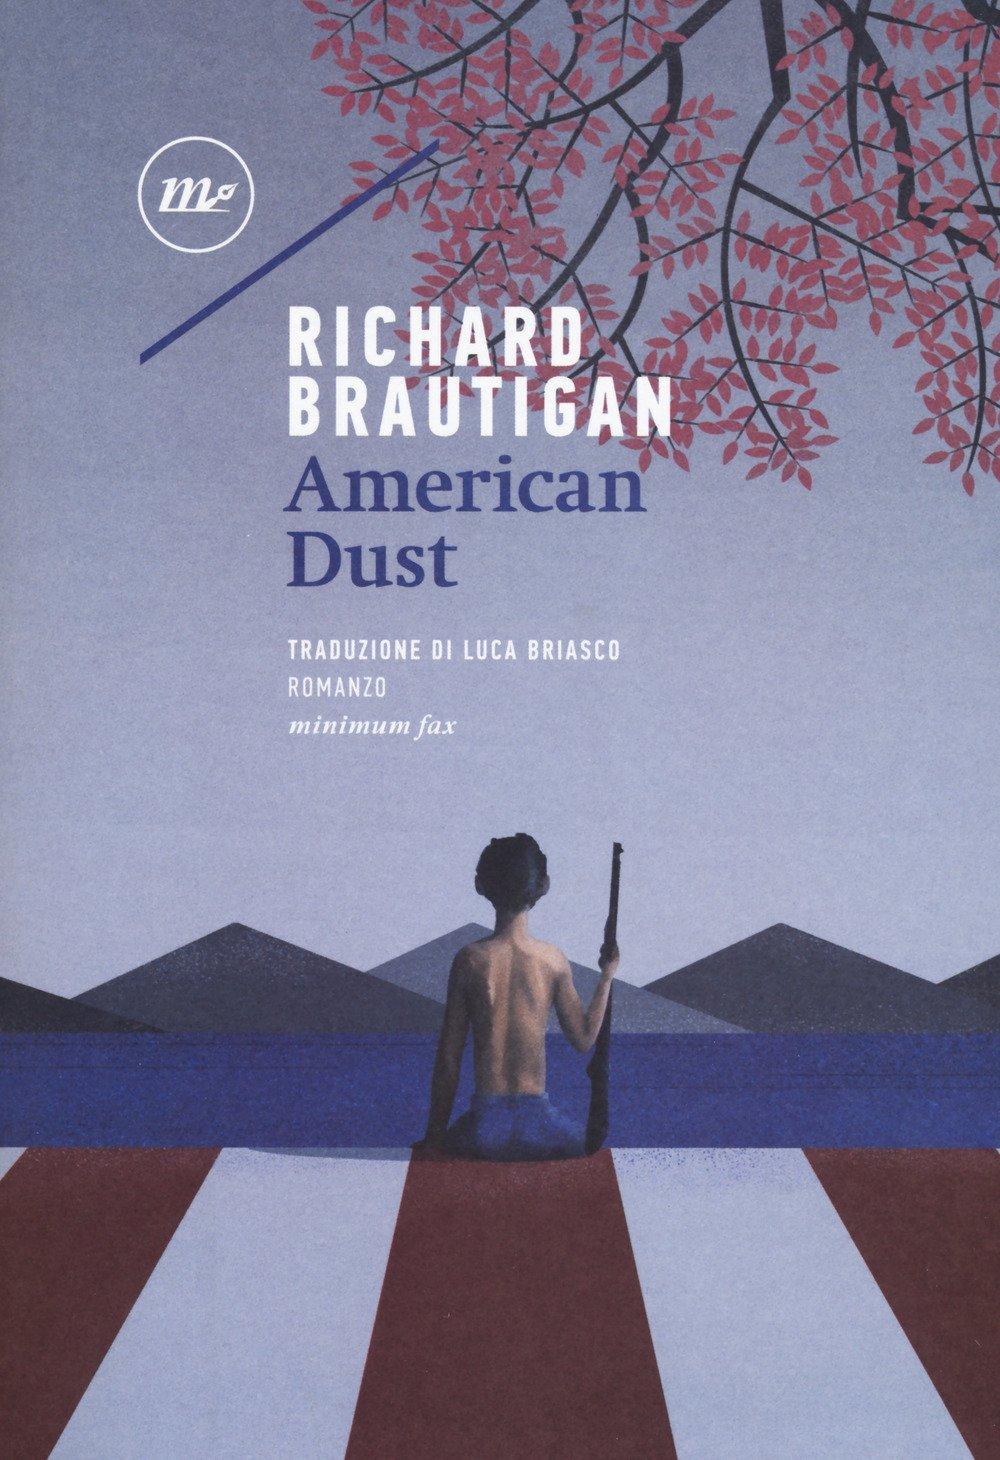 Richard Brautigan – American Dust